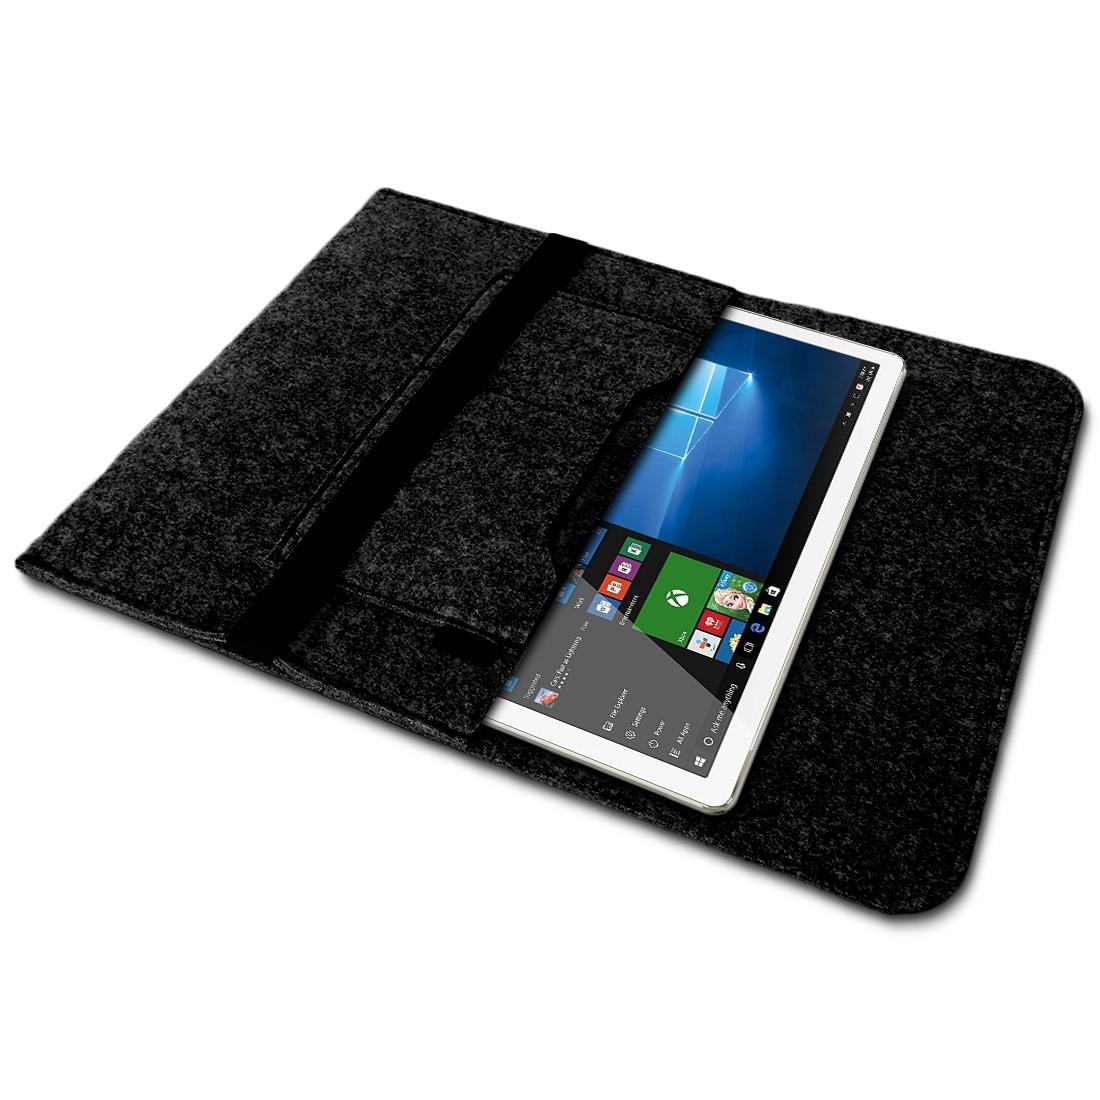 sleeve filz h lle samsung galaxy tab s2 s3 9 7 tablet. Black Bedroom Furniture Sets. Home Design Ideas